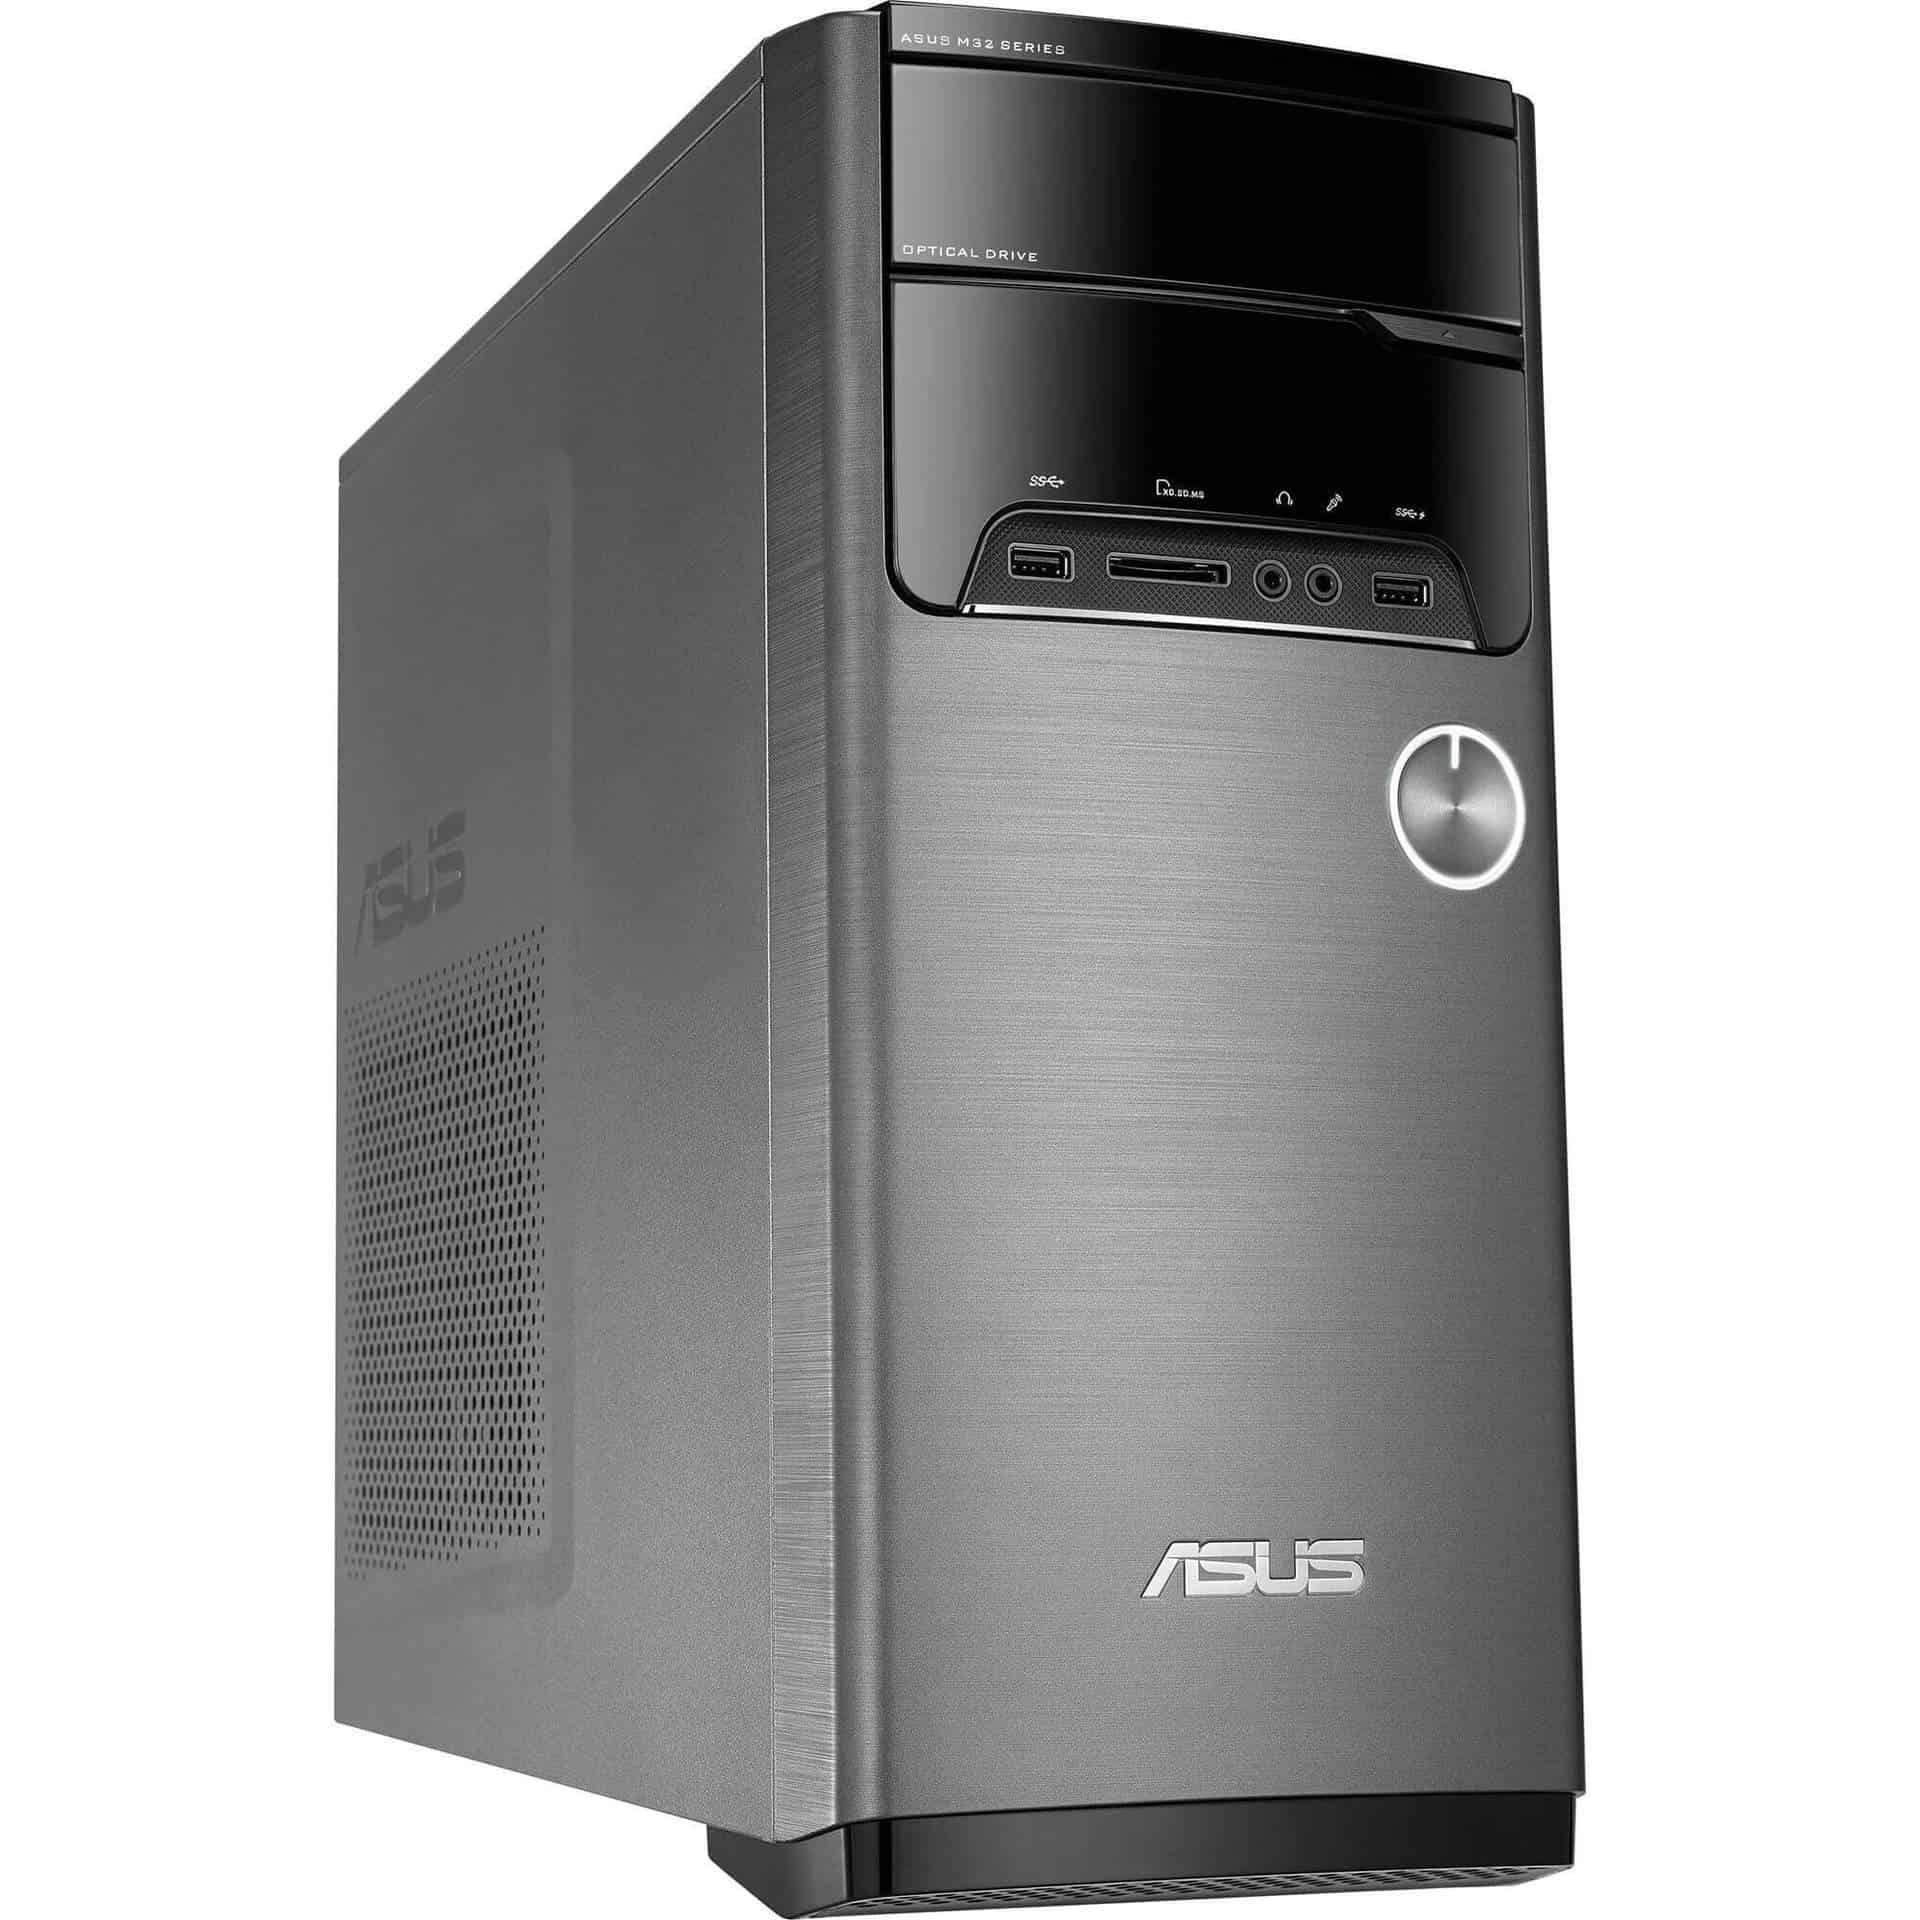 ASUS M32AD-RO051D - sistem PC accesibil cu o performanta incredibila